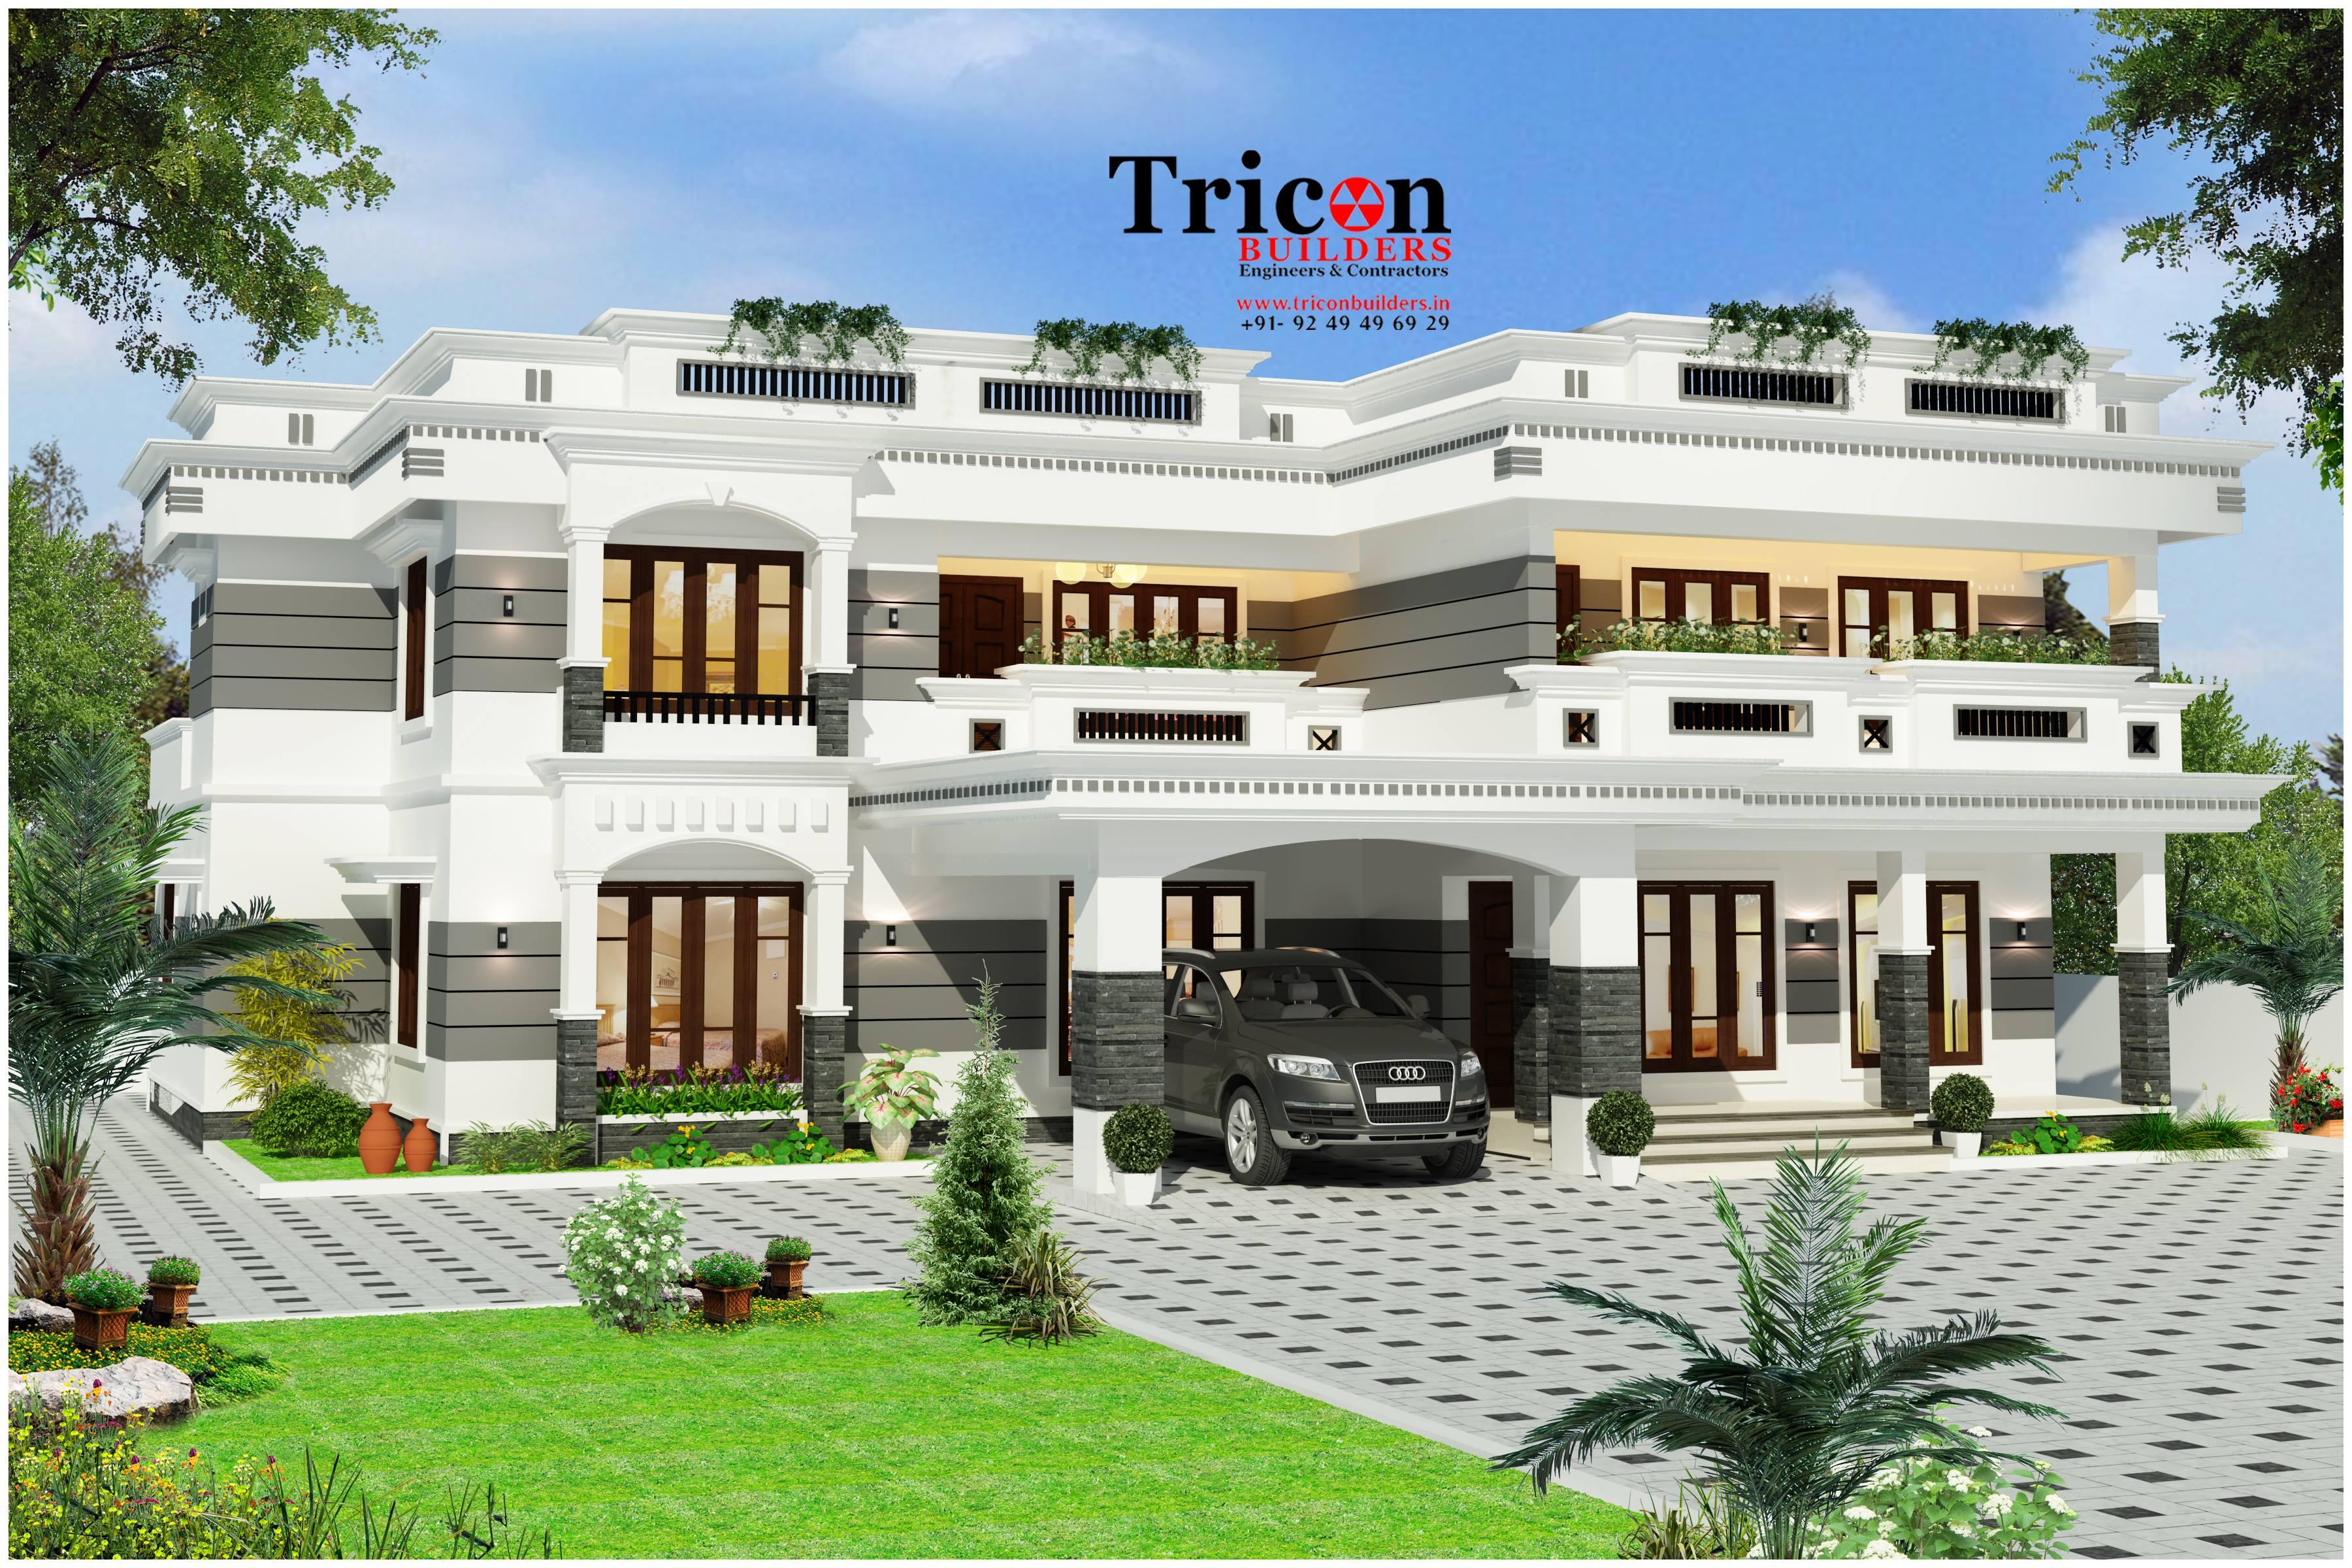 3353 Square Feet - 6 Bedroom Beautiful Luxury Villa